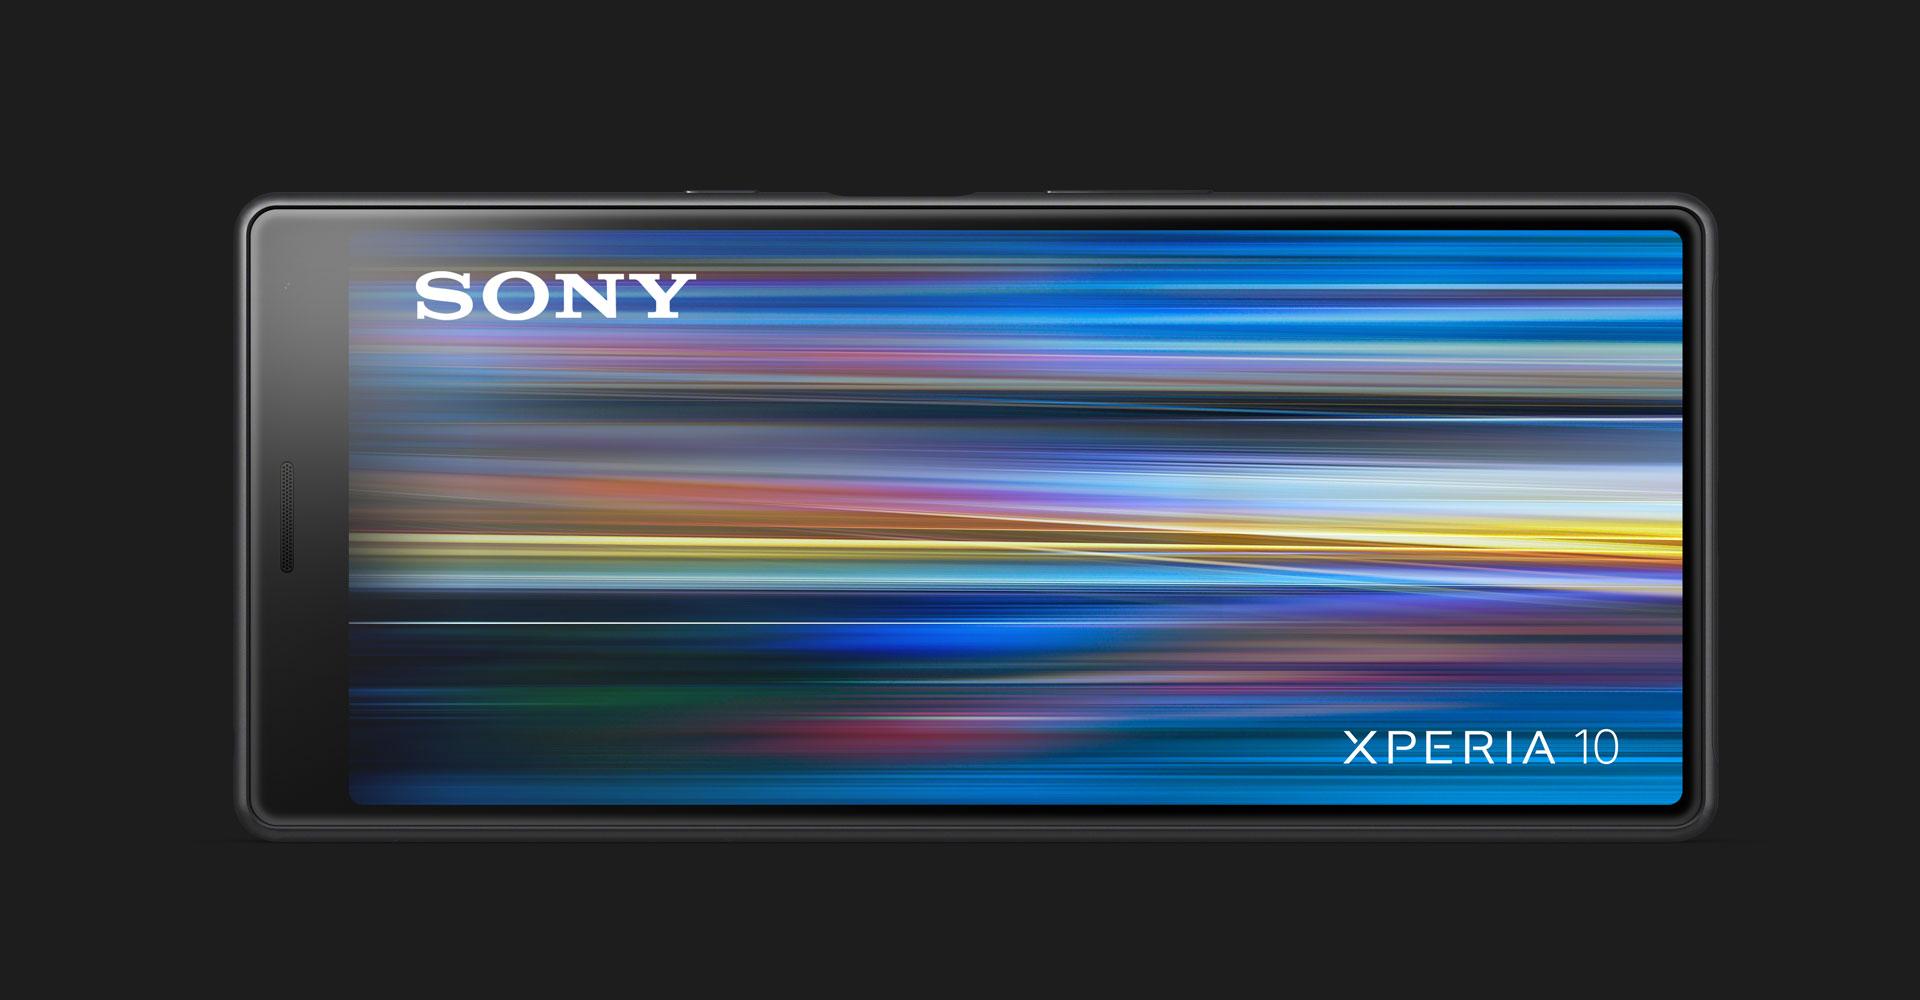 Jetzt bei Vodafone: Das Sony Xperia 10